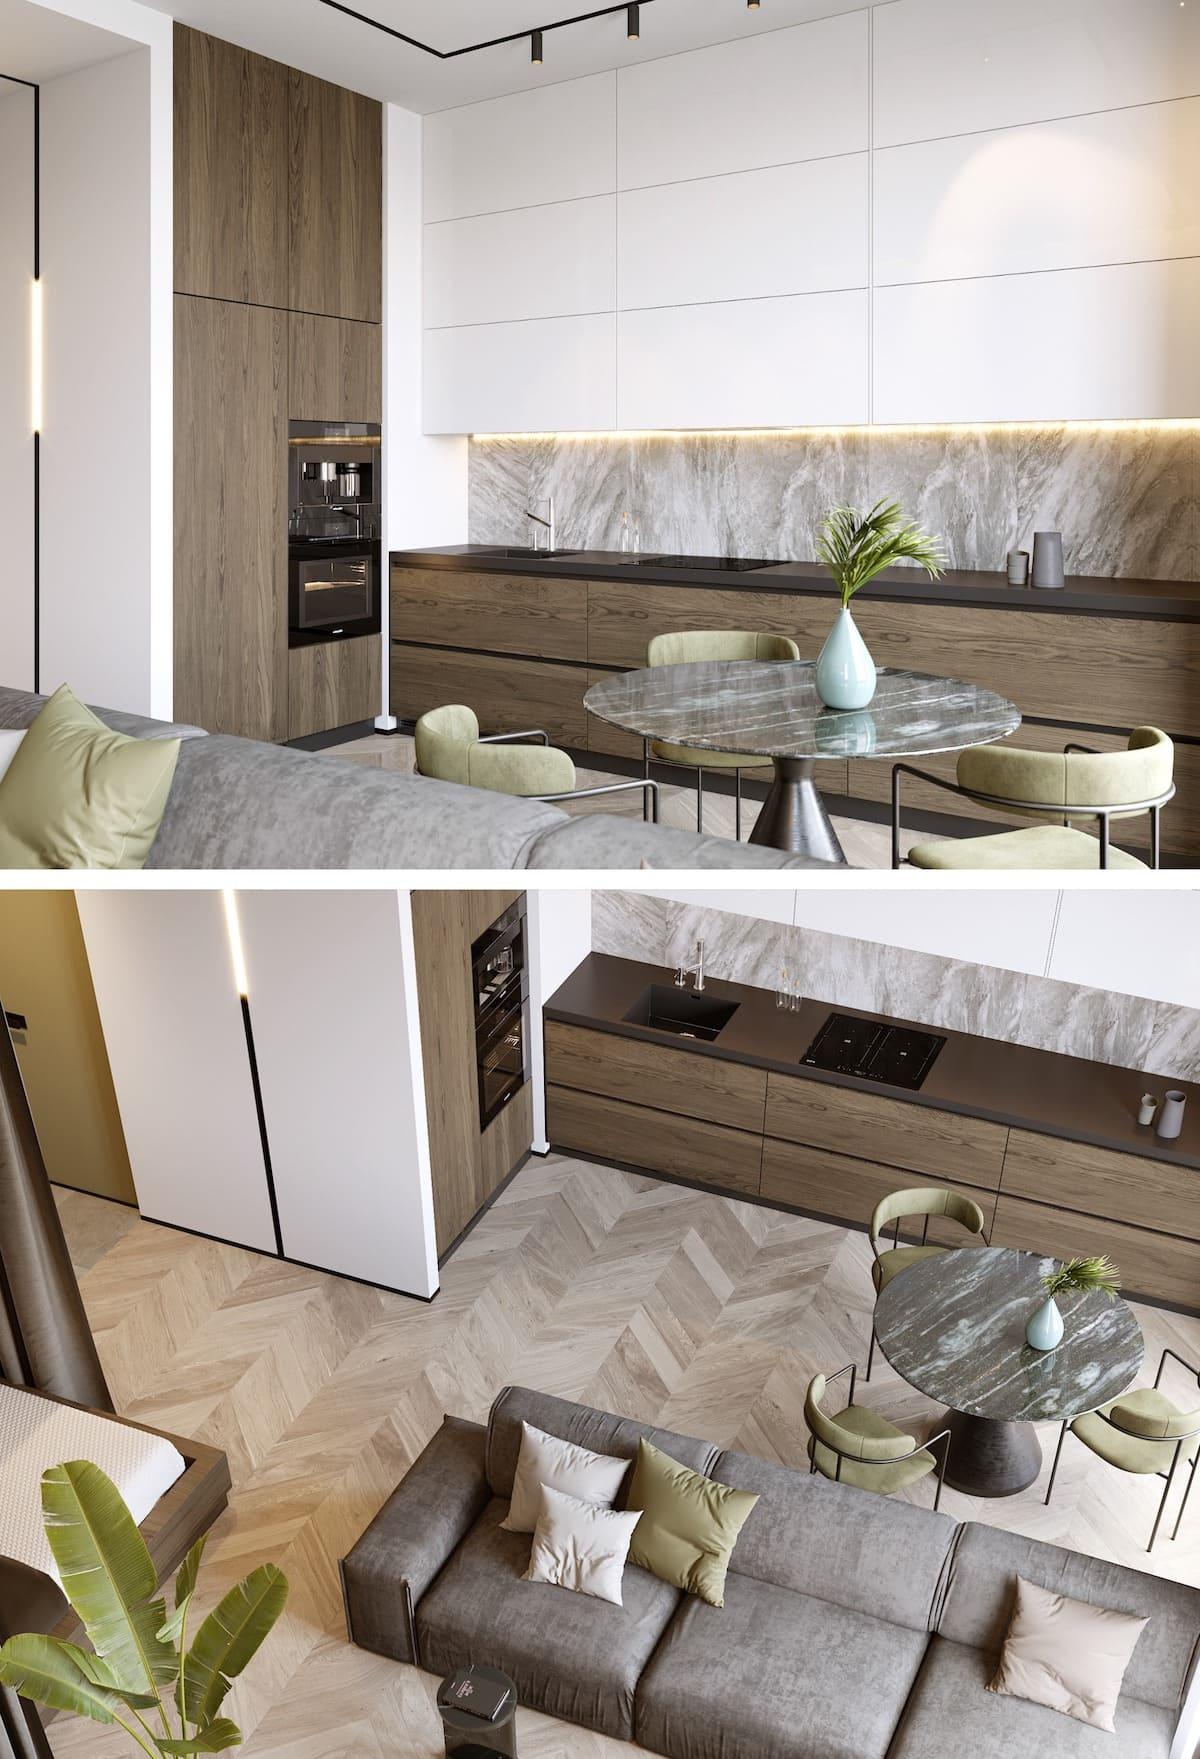 дизайн интерьера модной квартиры фото 77